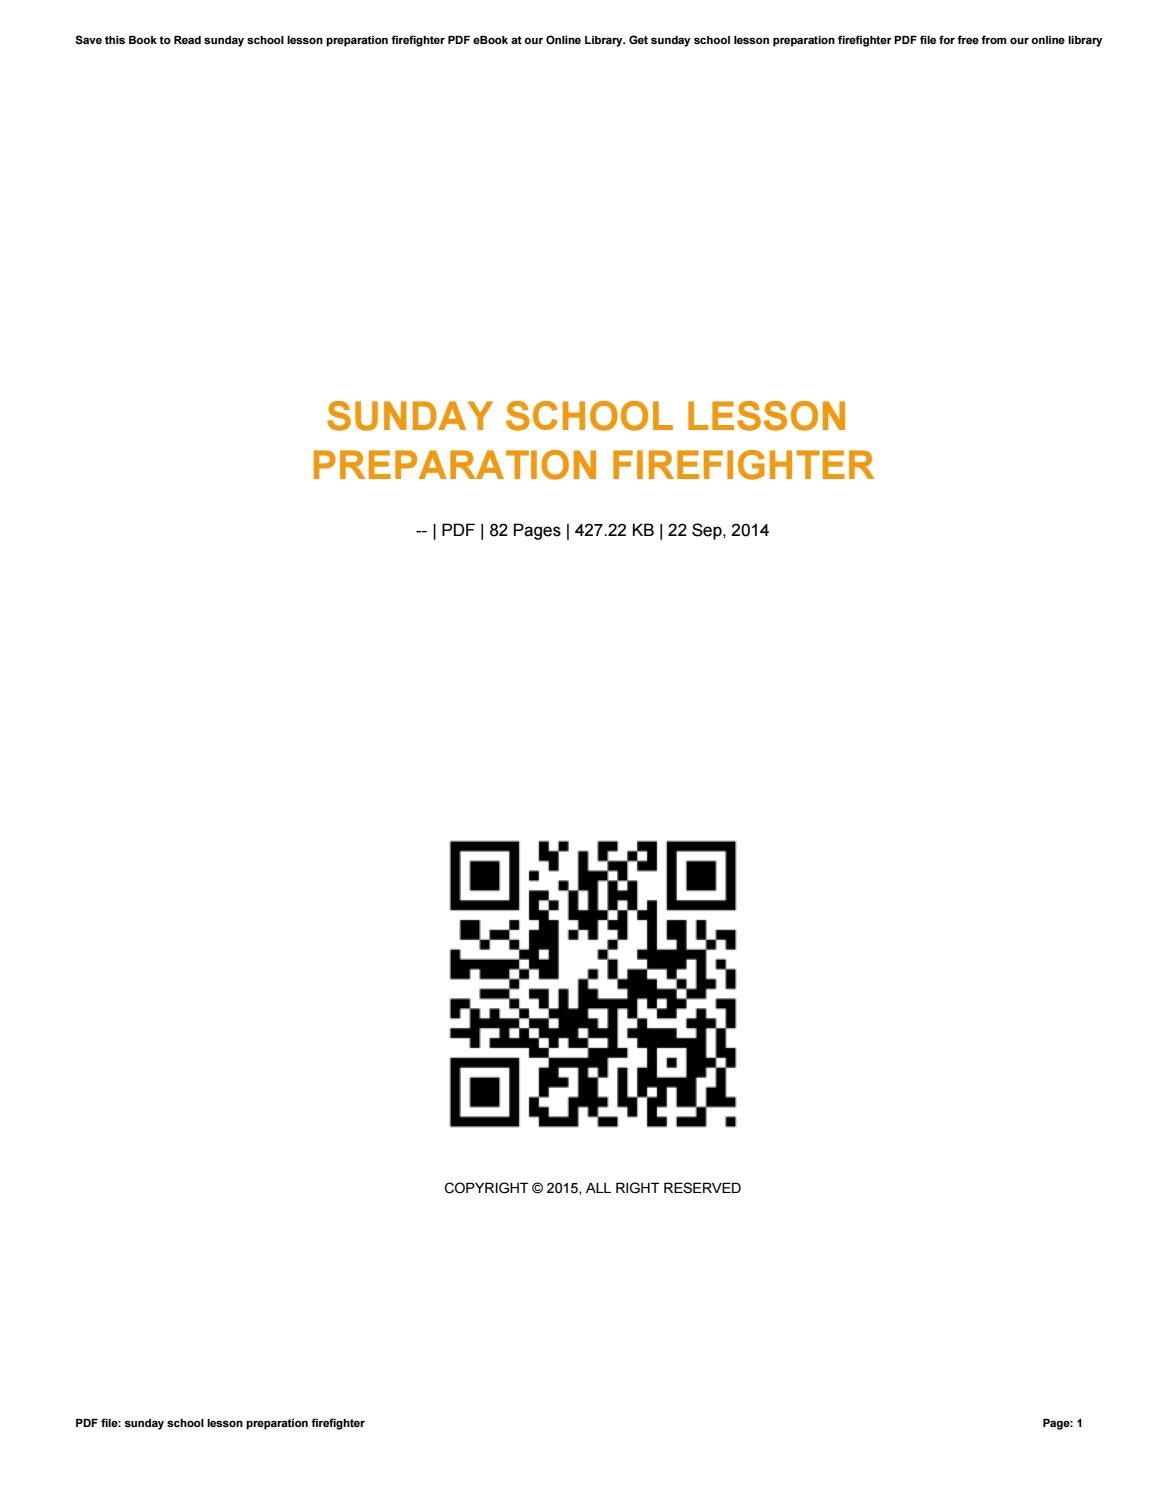 Sunday school lesson preparation firefighter by jklasdf74 - issuu